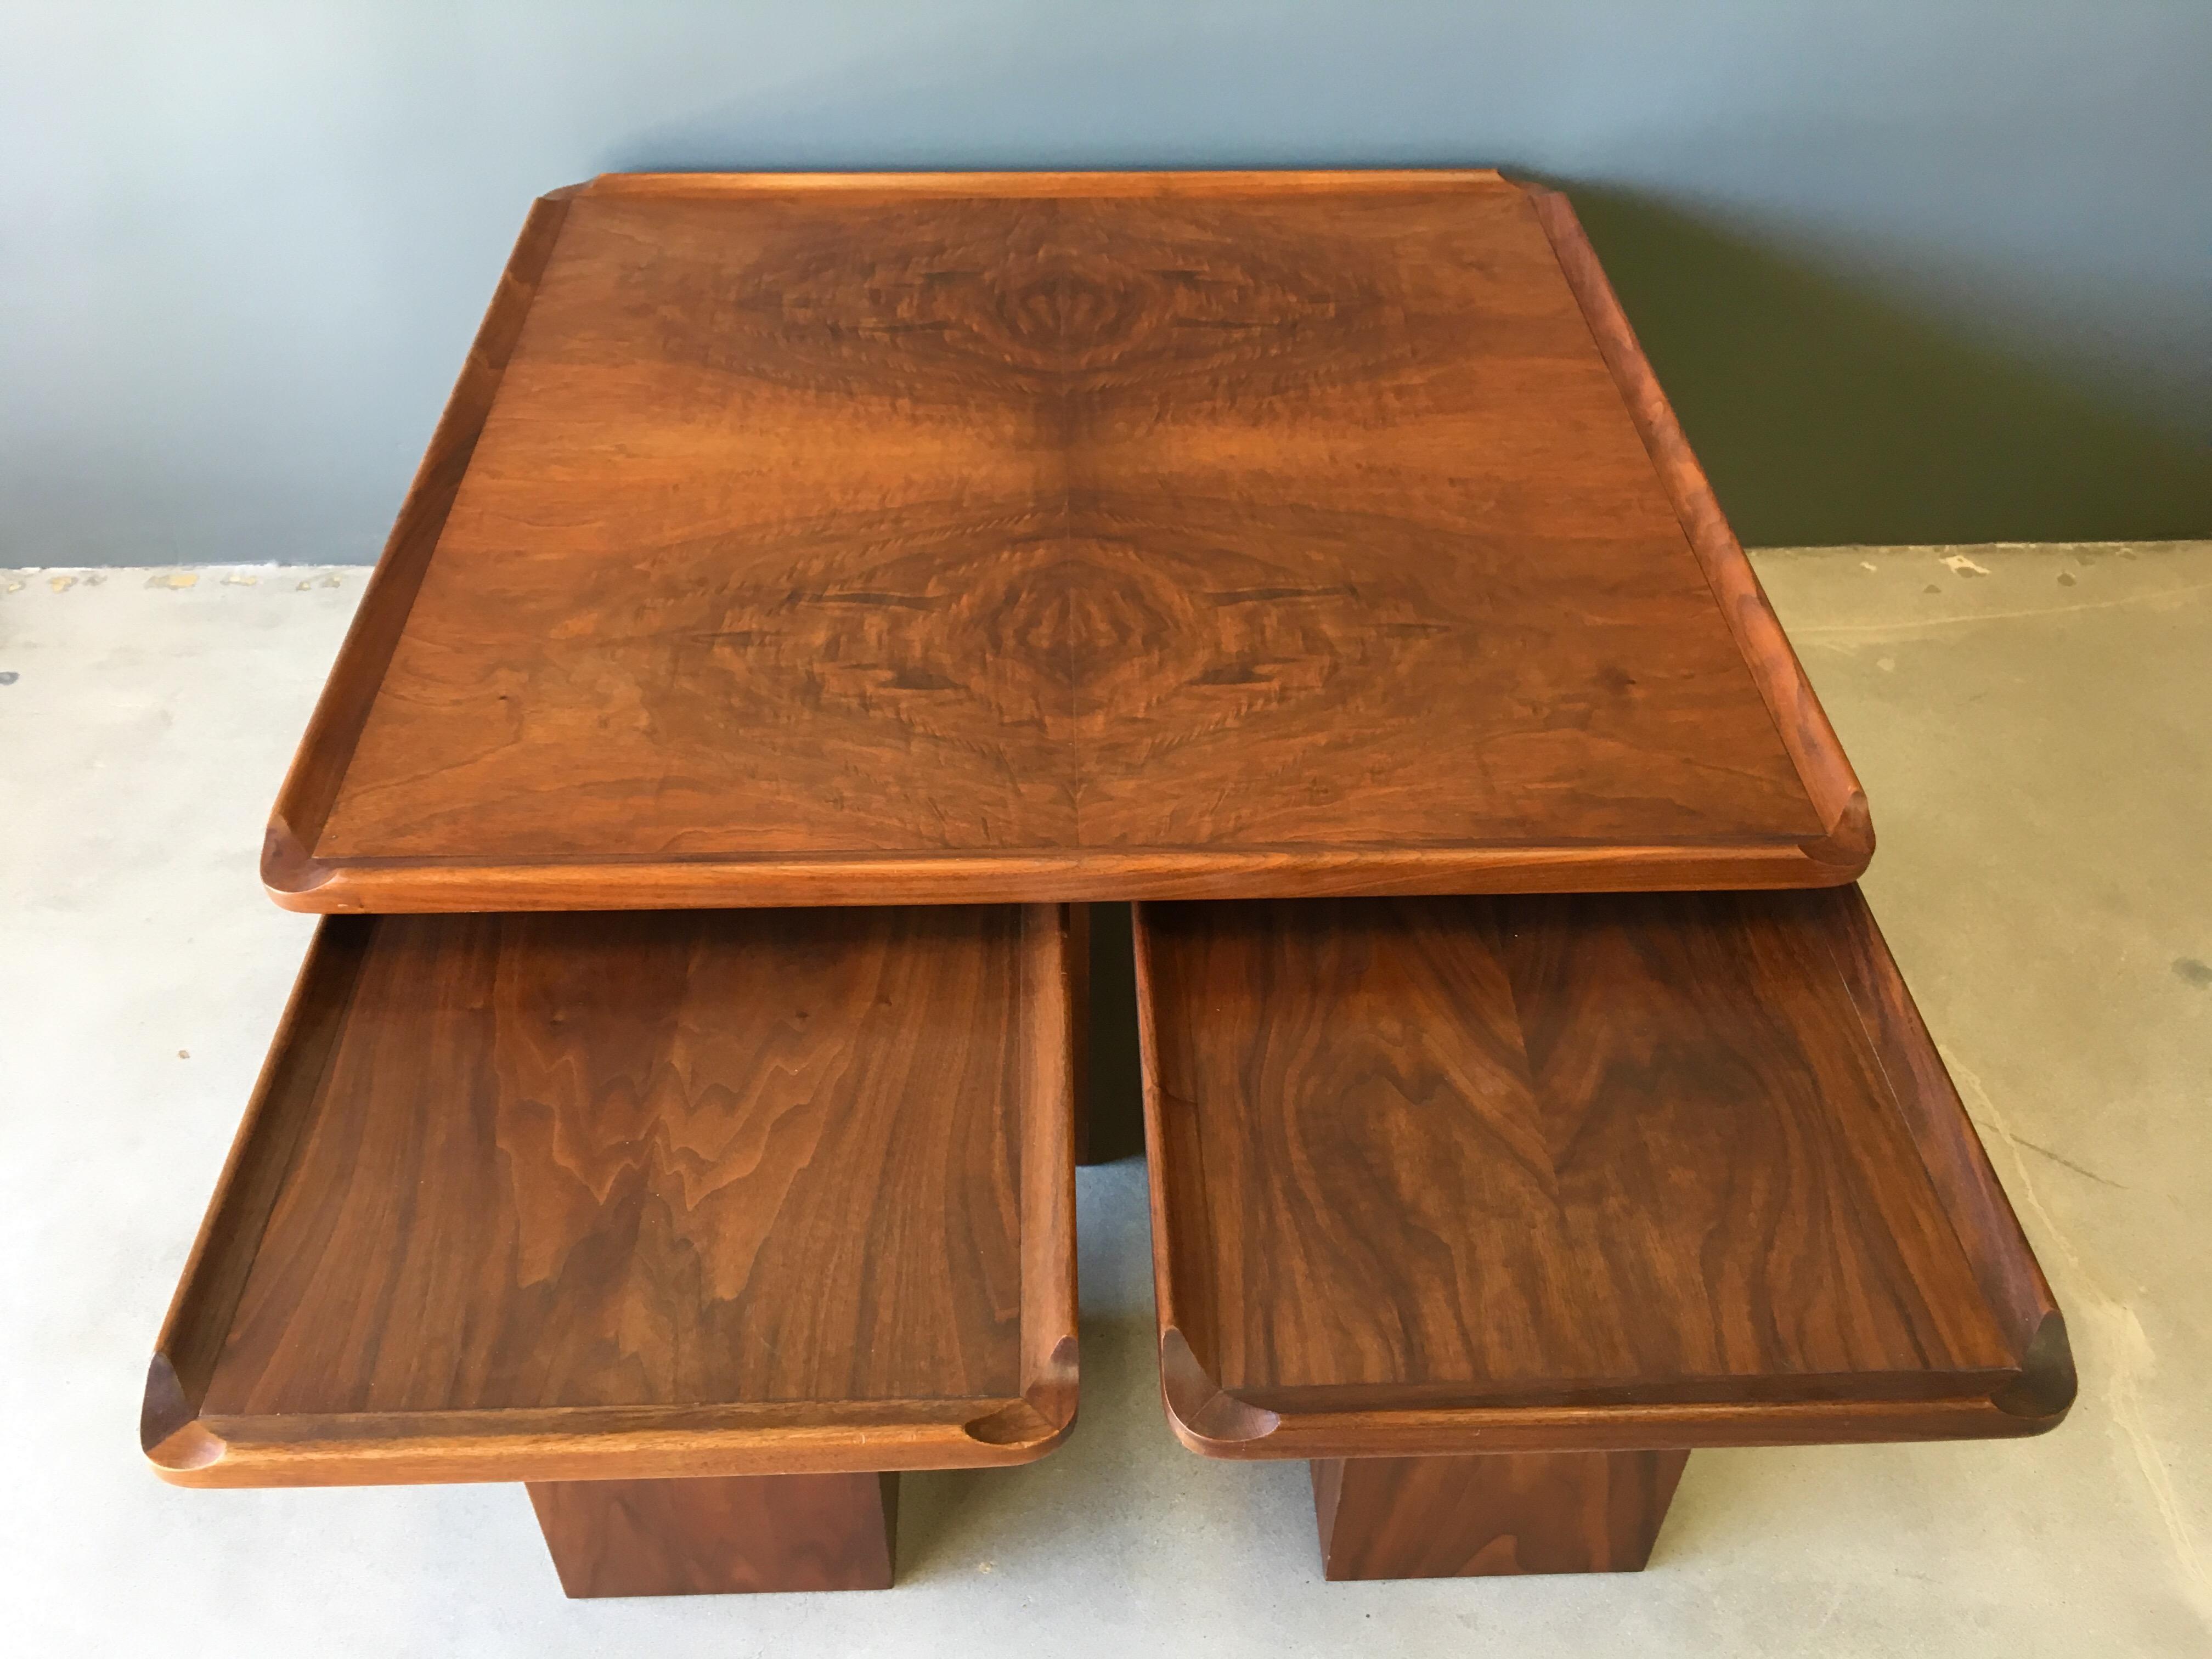 Brown Saltman Mid Century Coffee U0026 Nesting Tables   5 Pieces   Image 9 Of